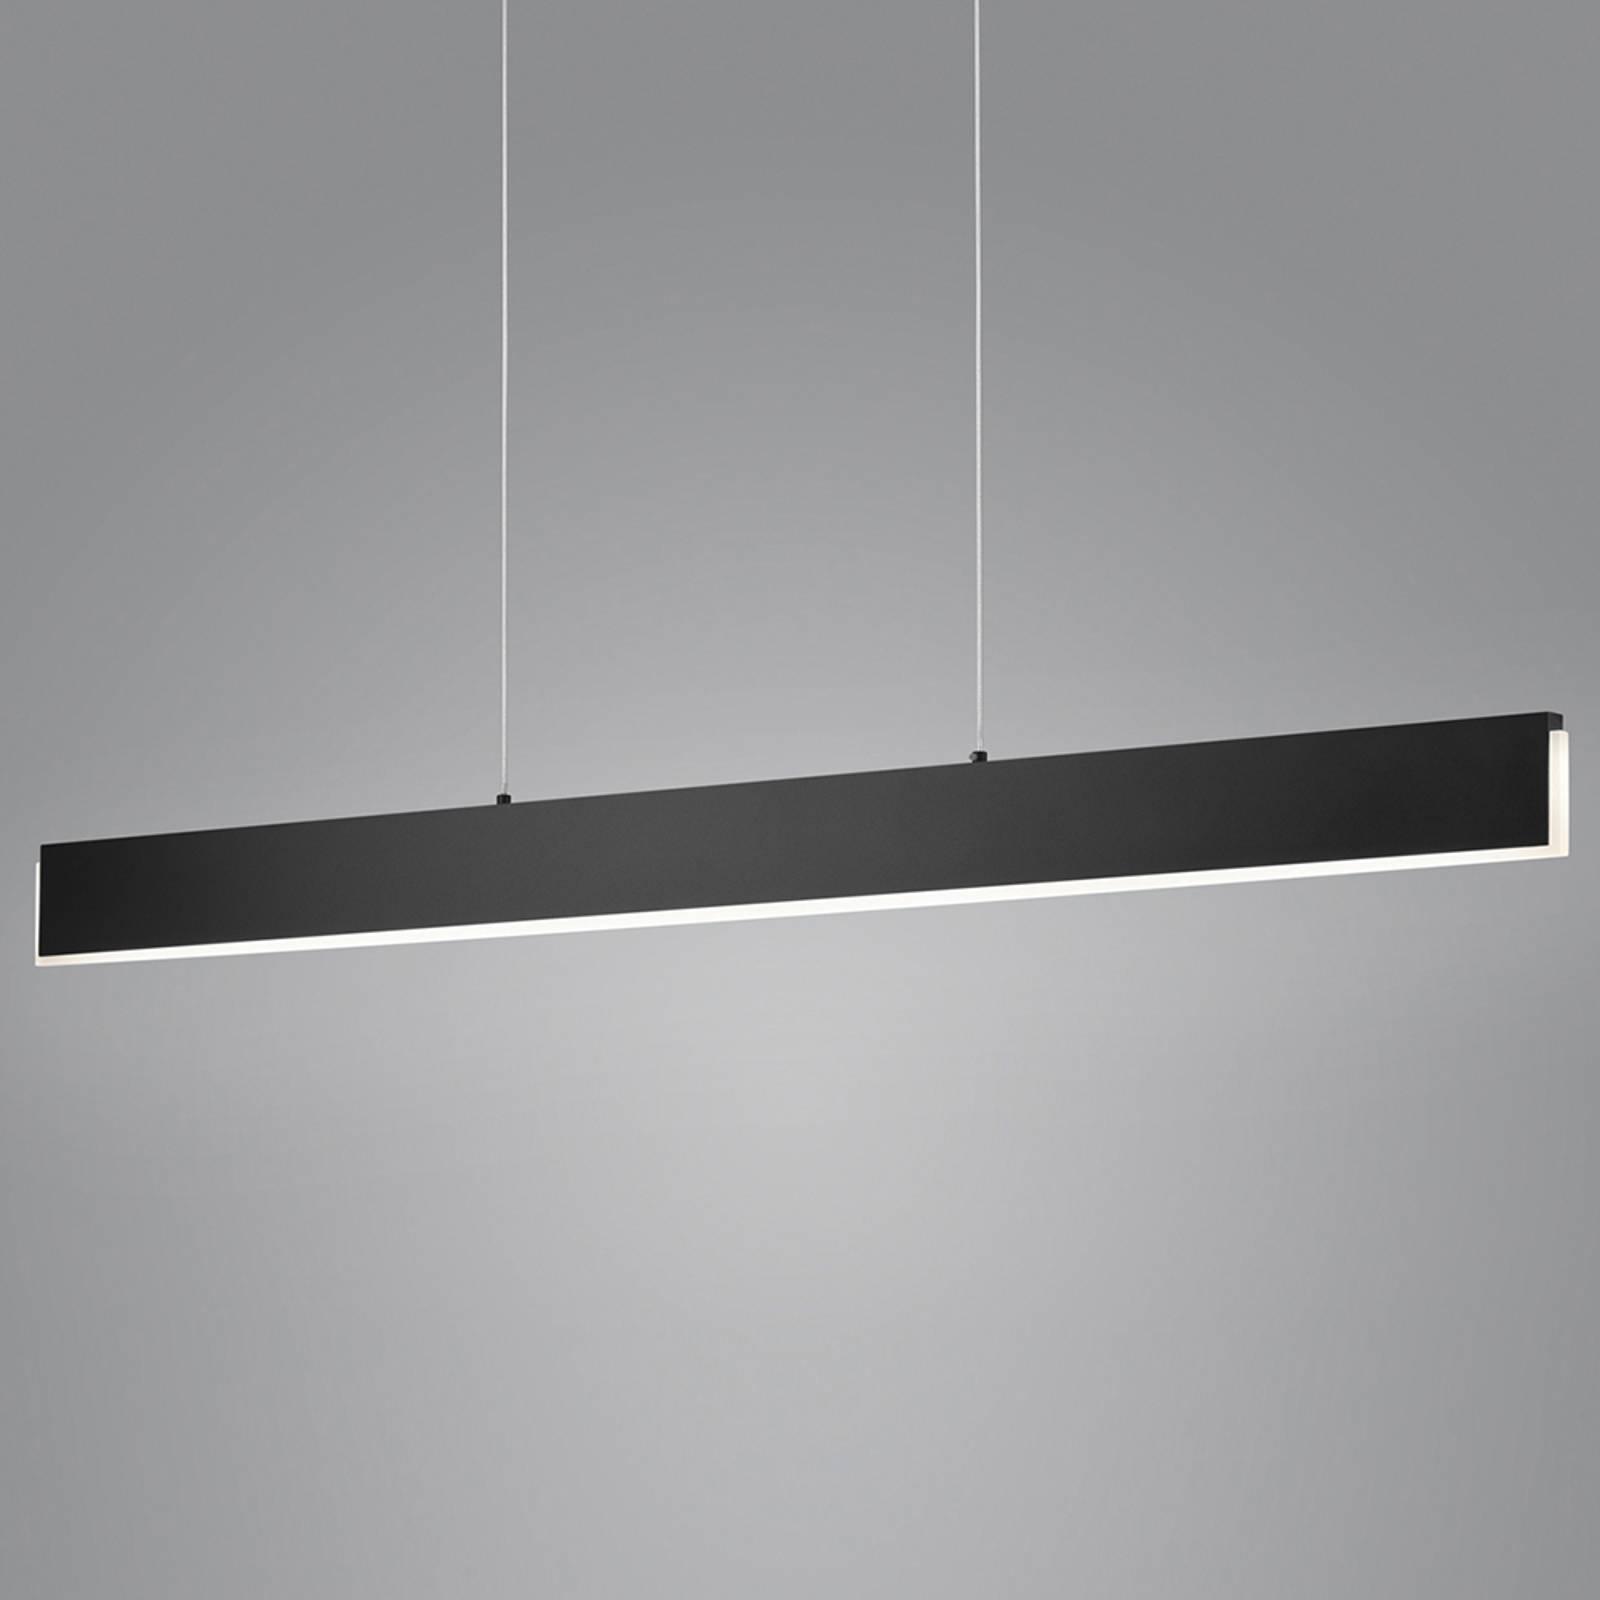 Helestra Nex LED-Pendelleuchte schwarz matt